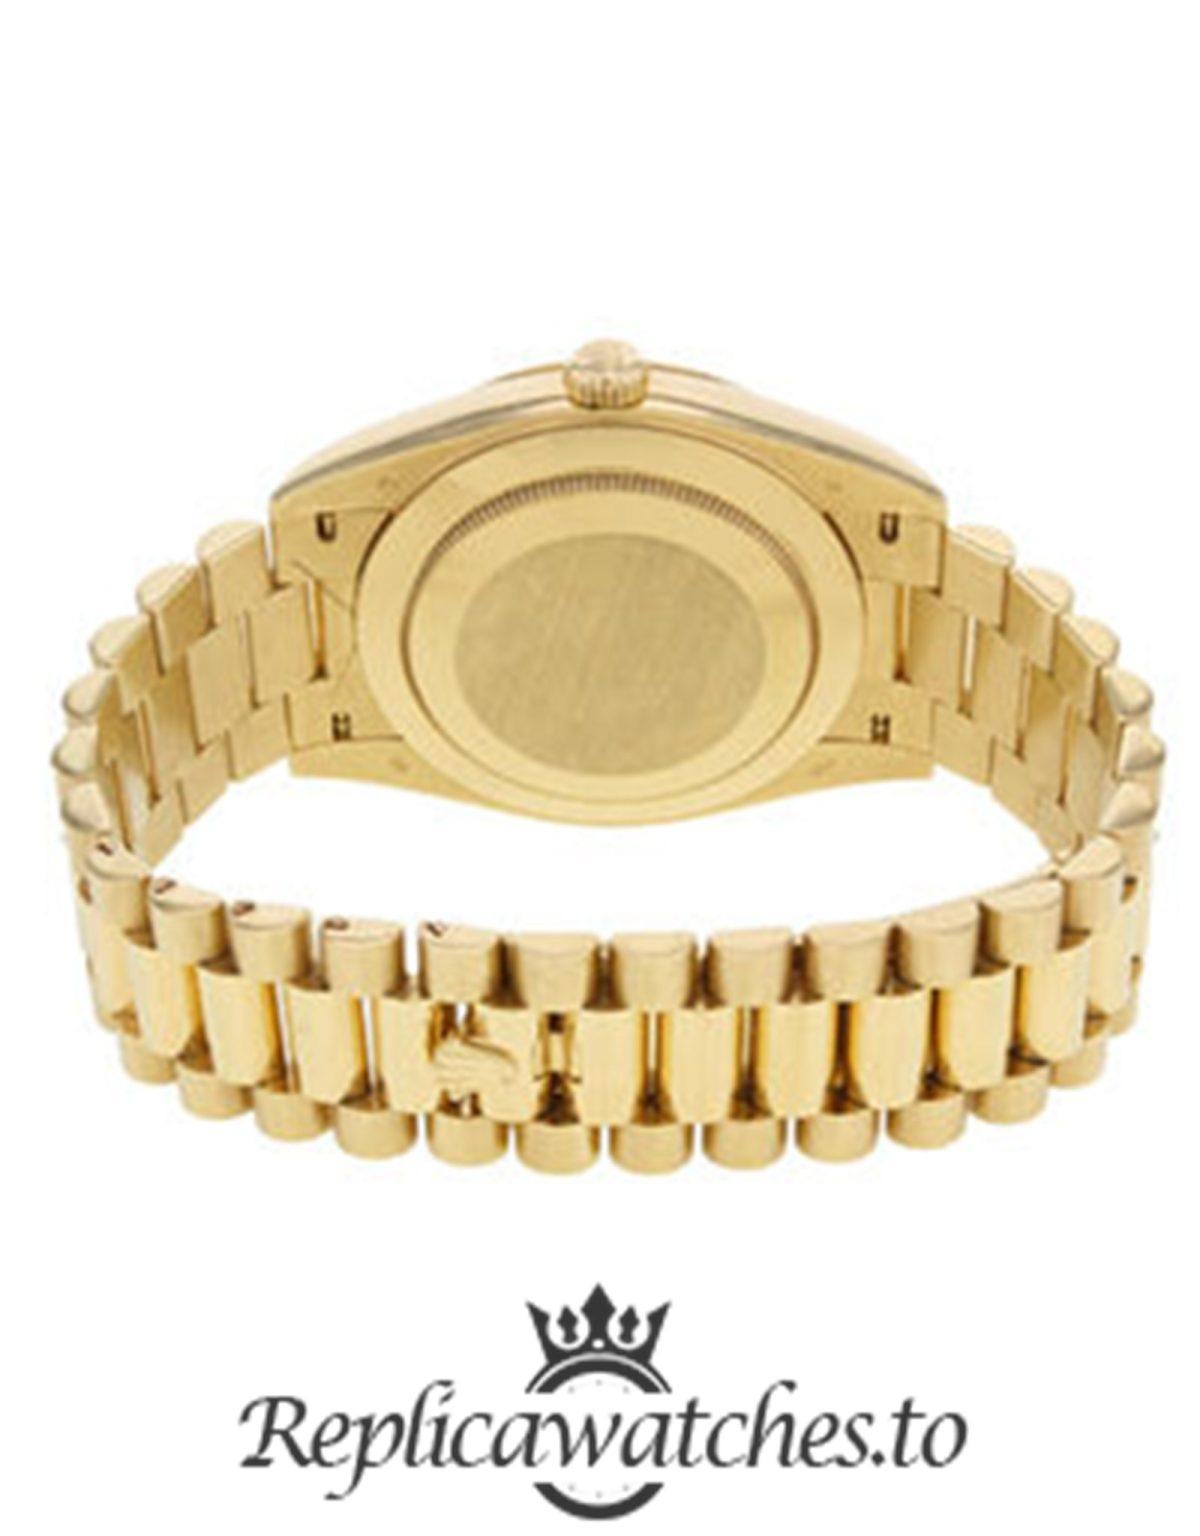 Rolex Day Date Replica 228238 002 Yellow Gold Strap 40MM